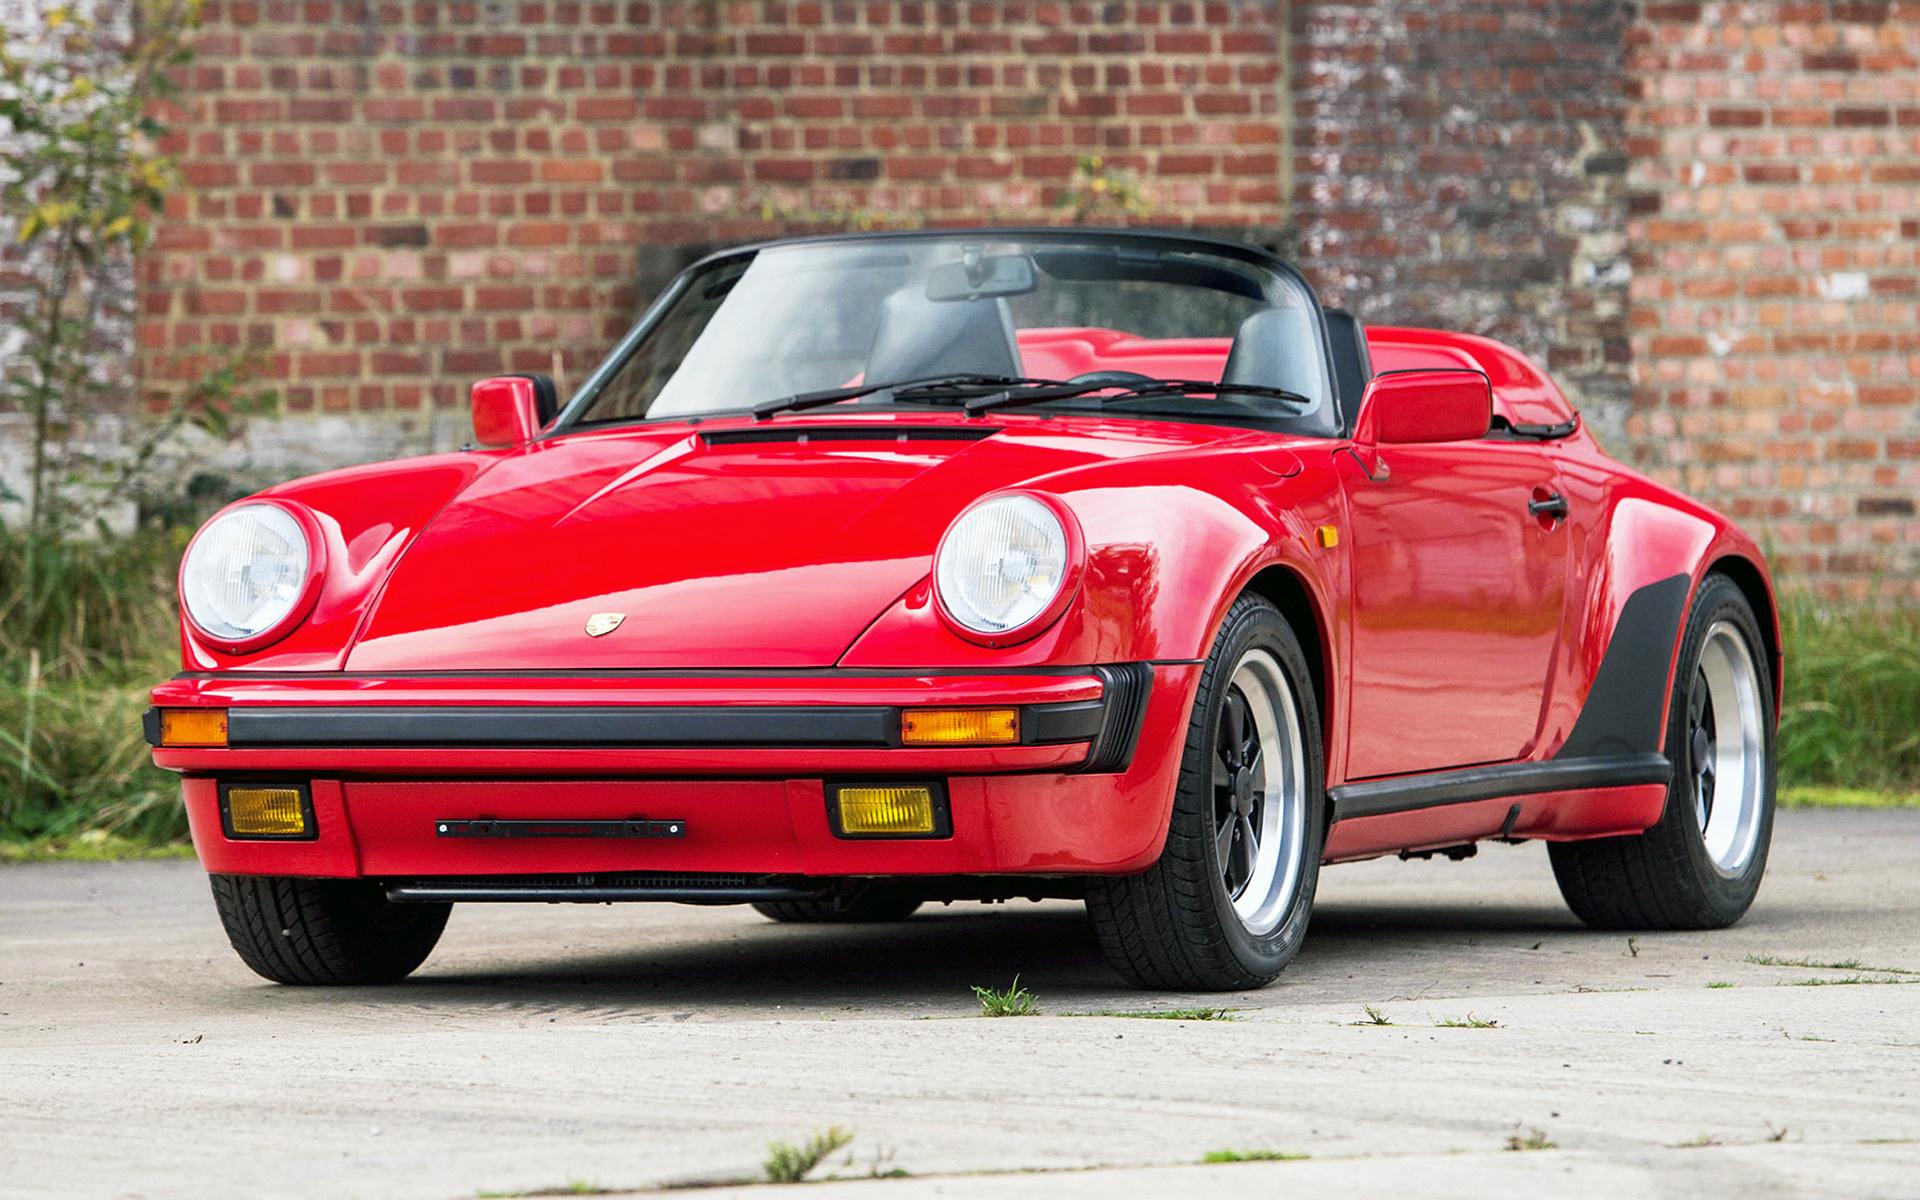 Porsche 911 R >> 1989 Porsche 911 Speedster Turbo-look - Wallpapers and HD ...